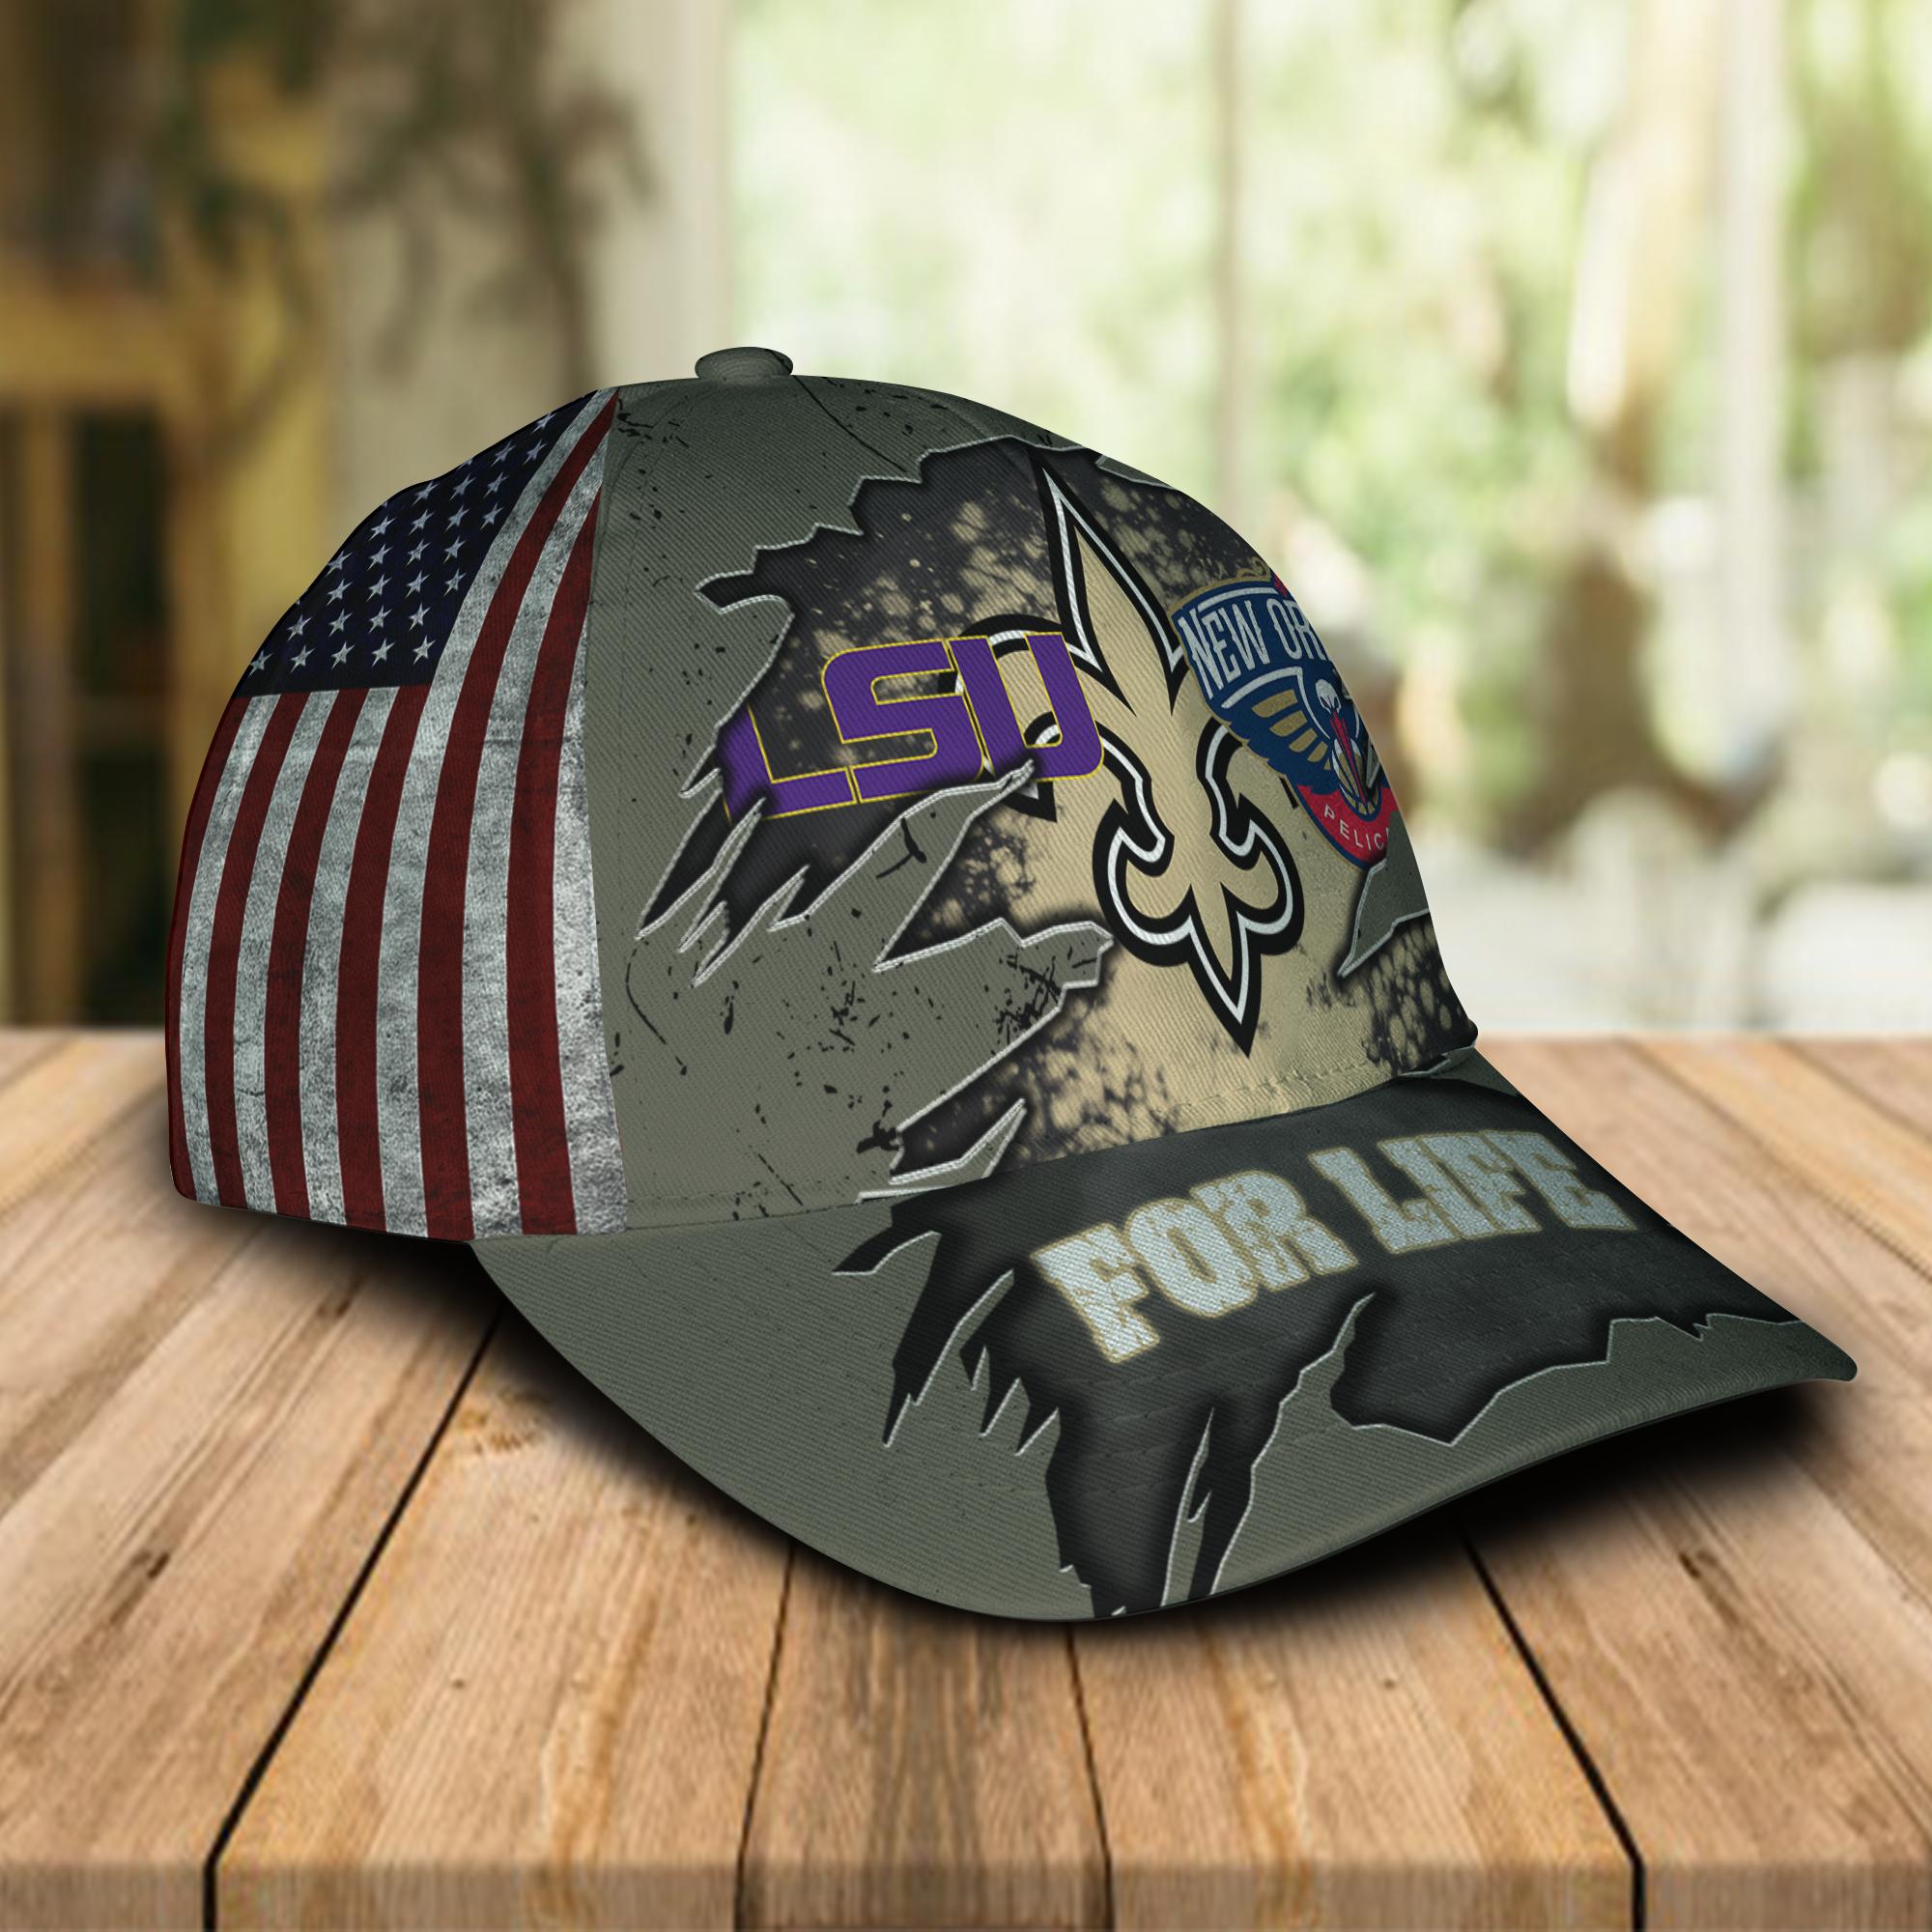 New Orleans Saints New Orleans Pelicans LSU Tigers For Life Hat Cap